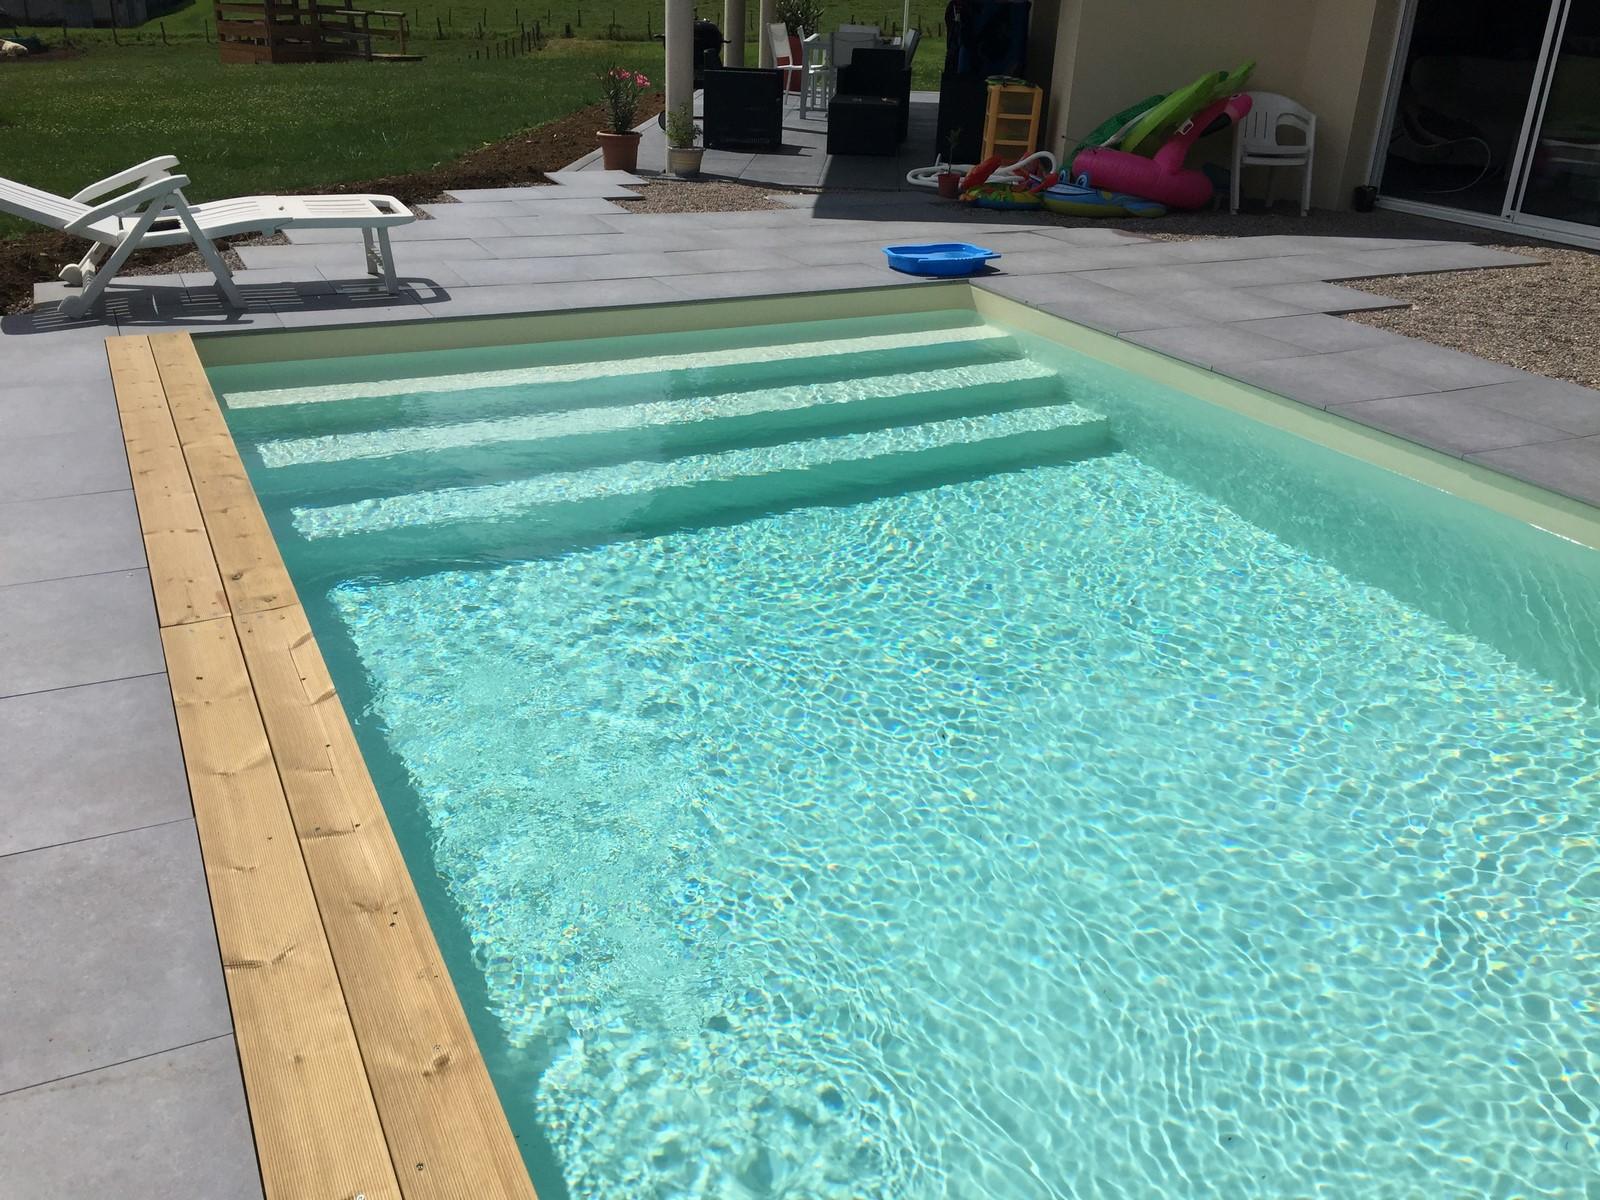 Kit piscine bois hors sol rectangulaire luxe 620x420 x 130 for Kit piscine bois rectangulaire